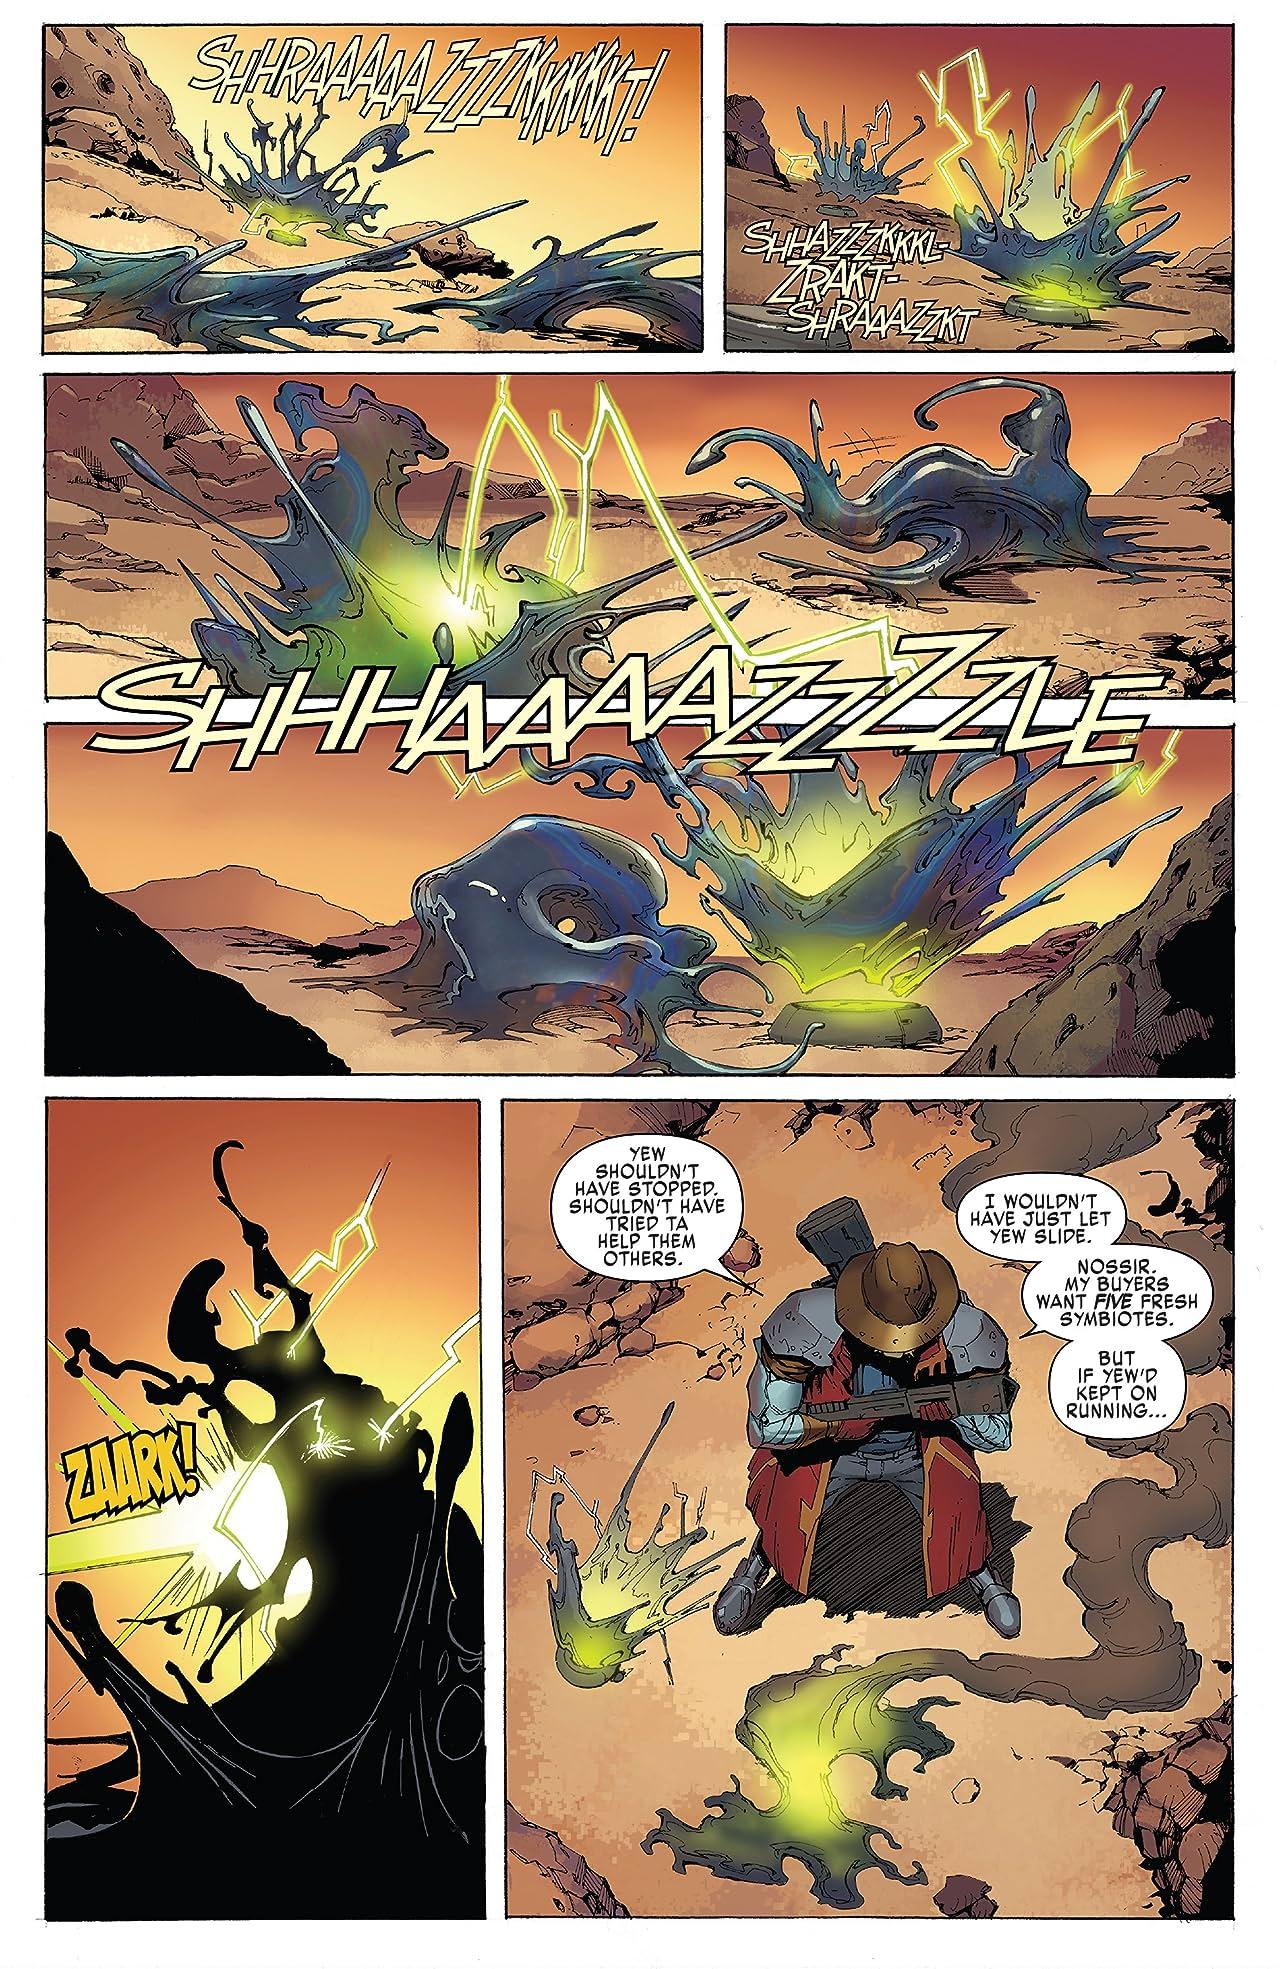 Venom & X-Men: Poison-X